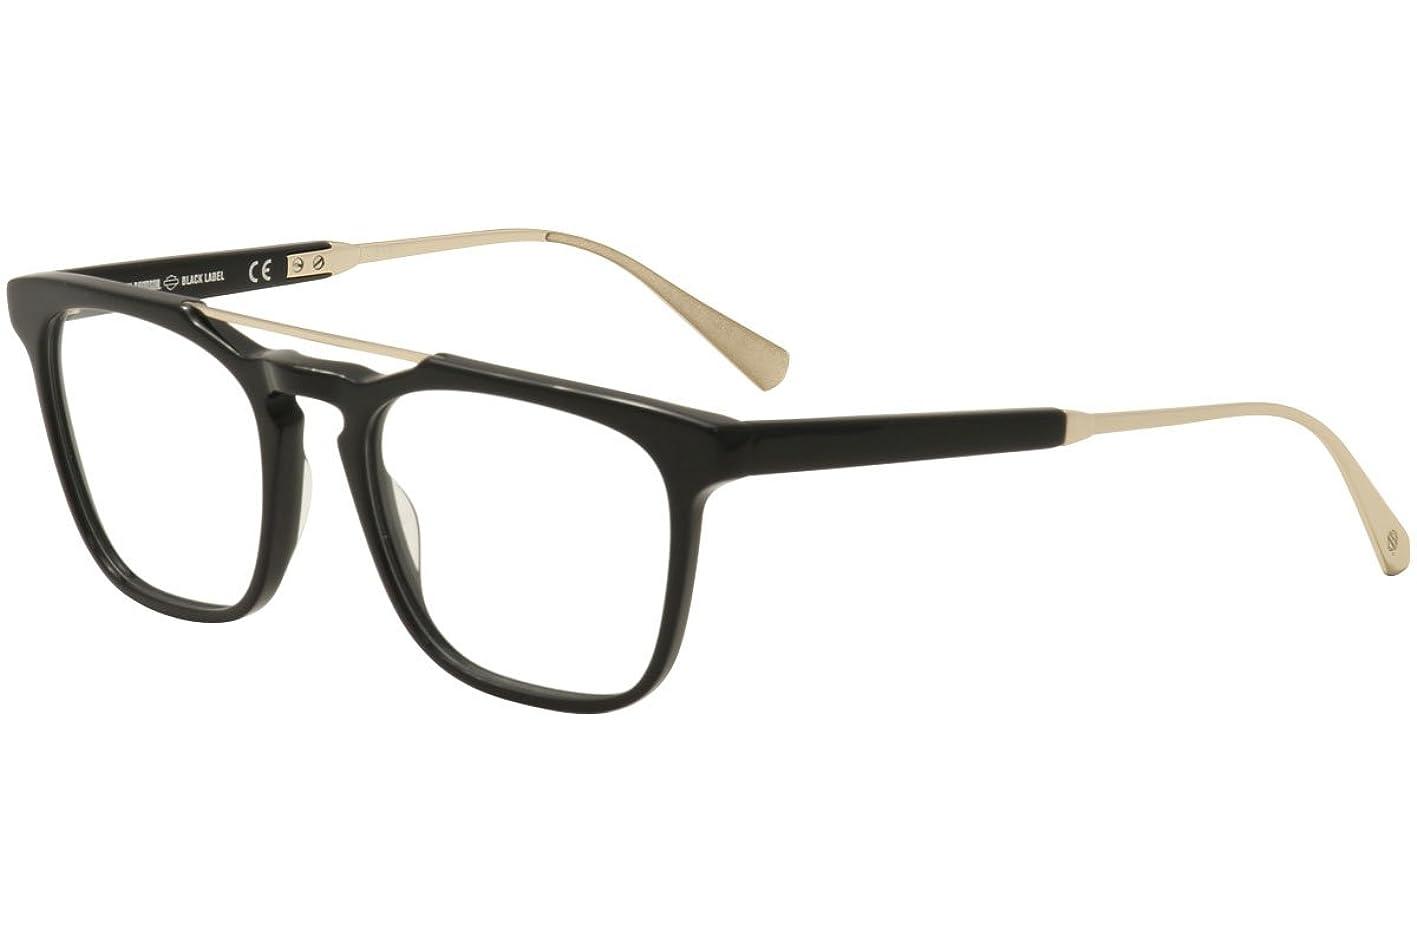 Harley-Davidson Black Label Eyeglasses HD1025 1025 001 Black Optical Frame 52mm icebjbkxpxv993